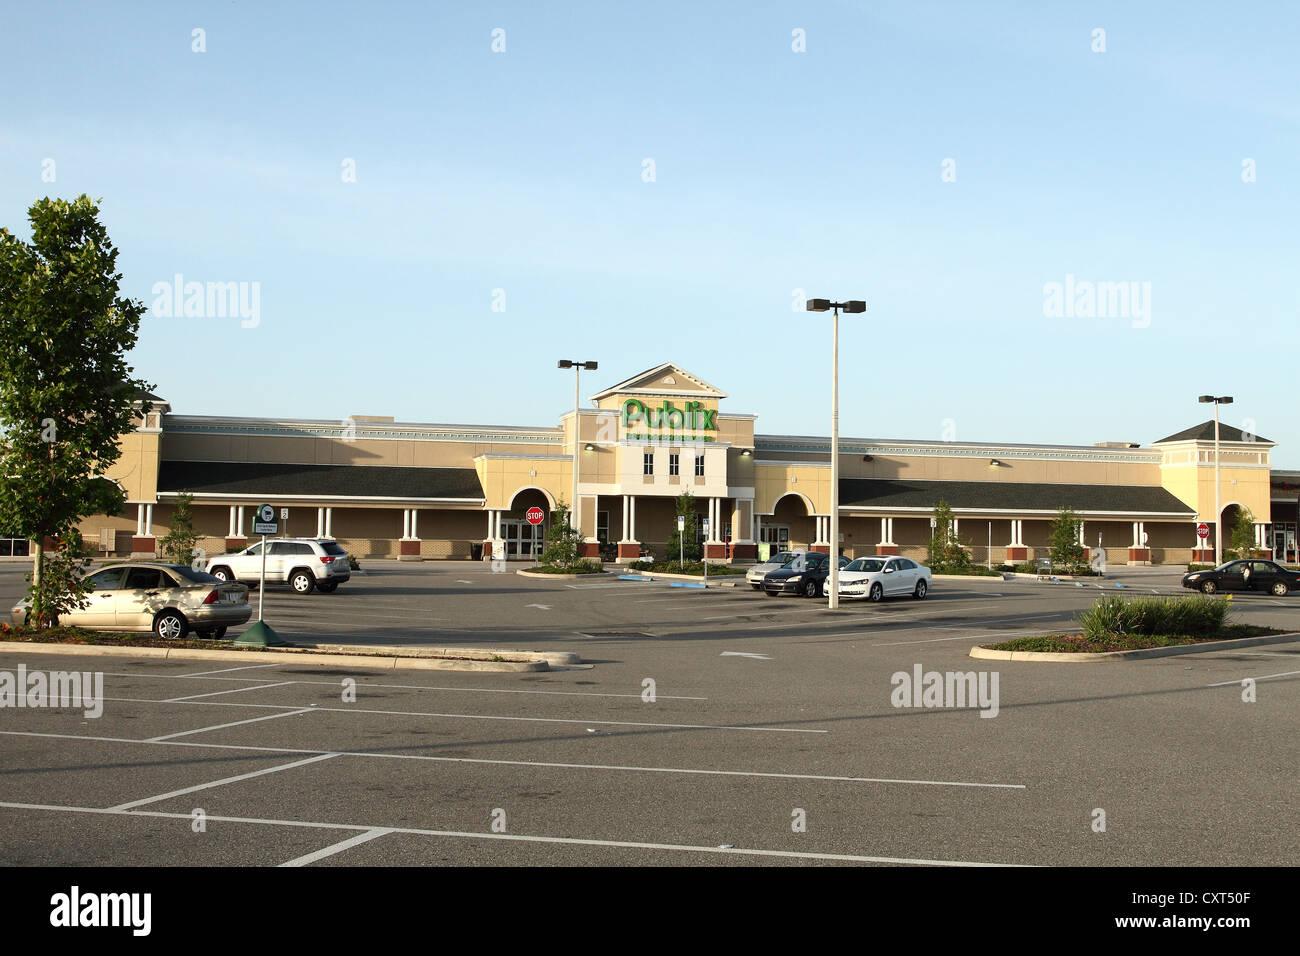 Publix Supermarket near Davenport, Florida USA Stock Photo